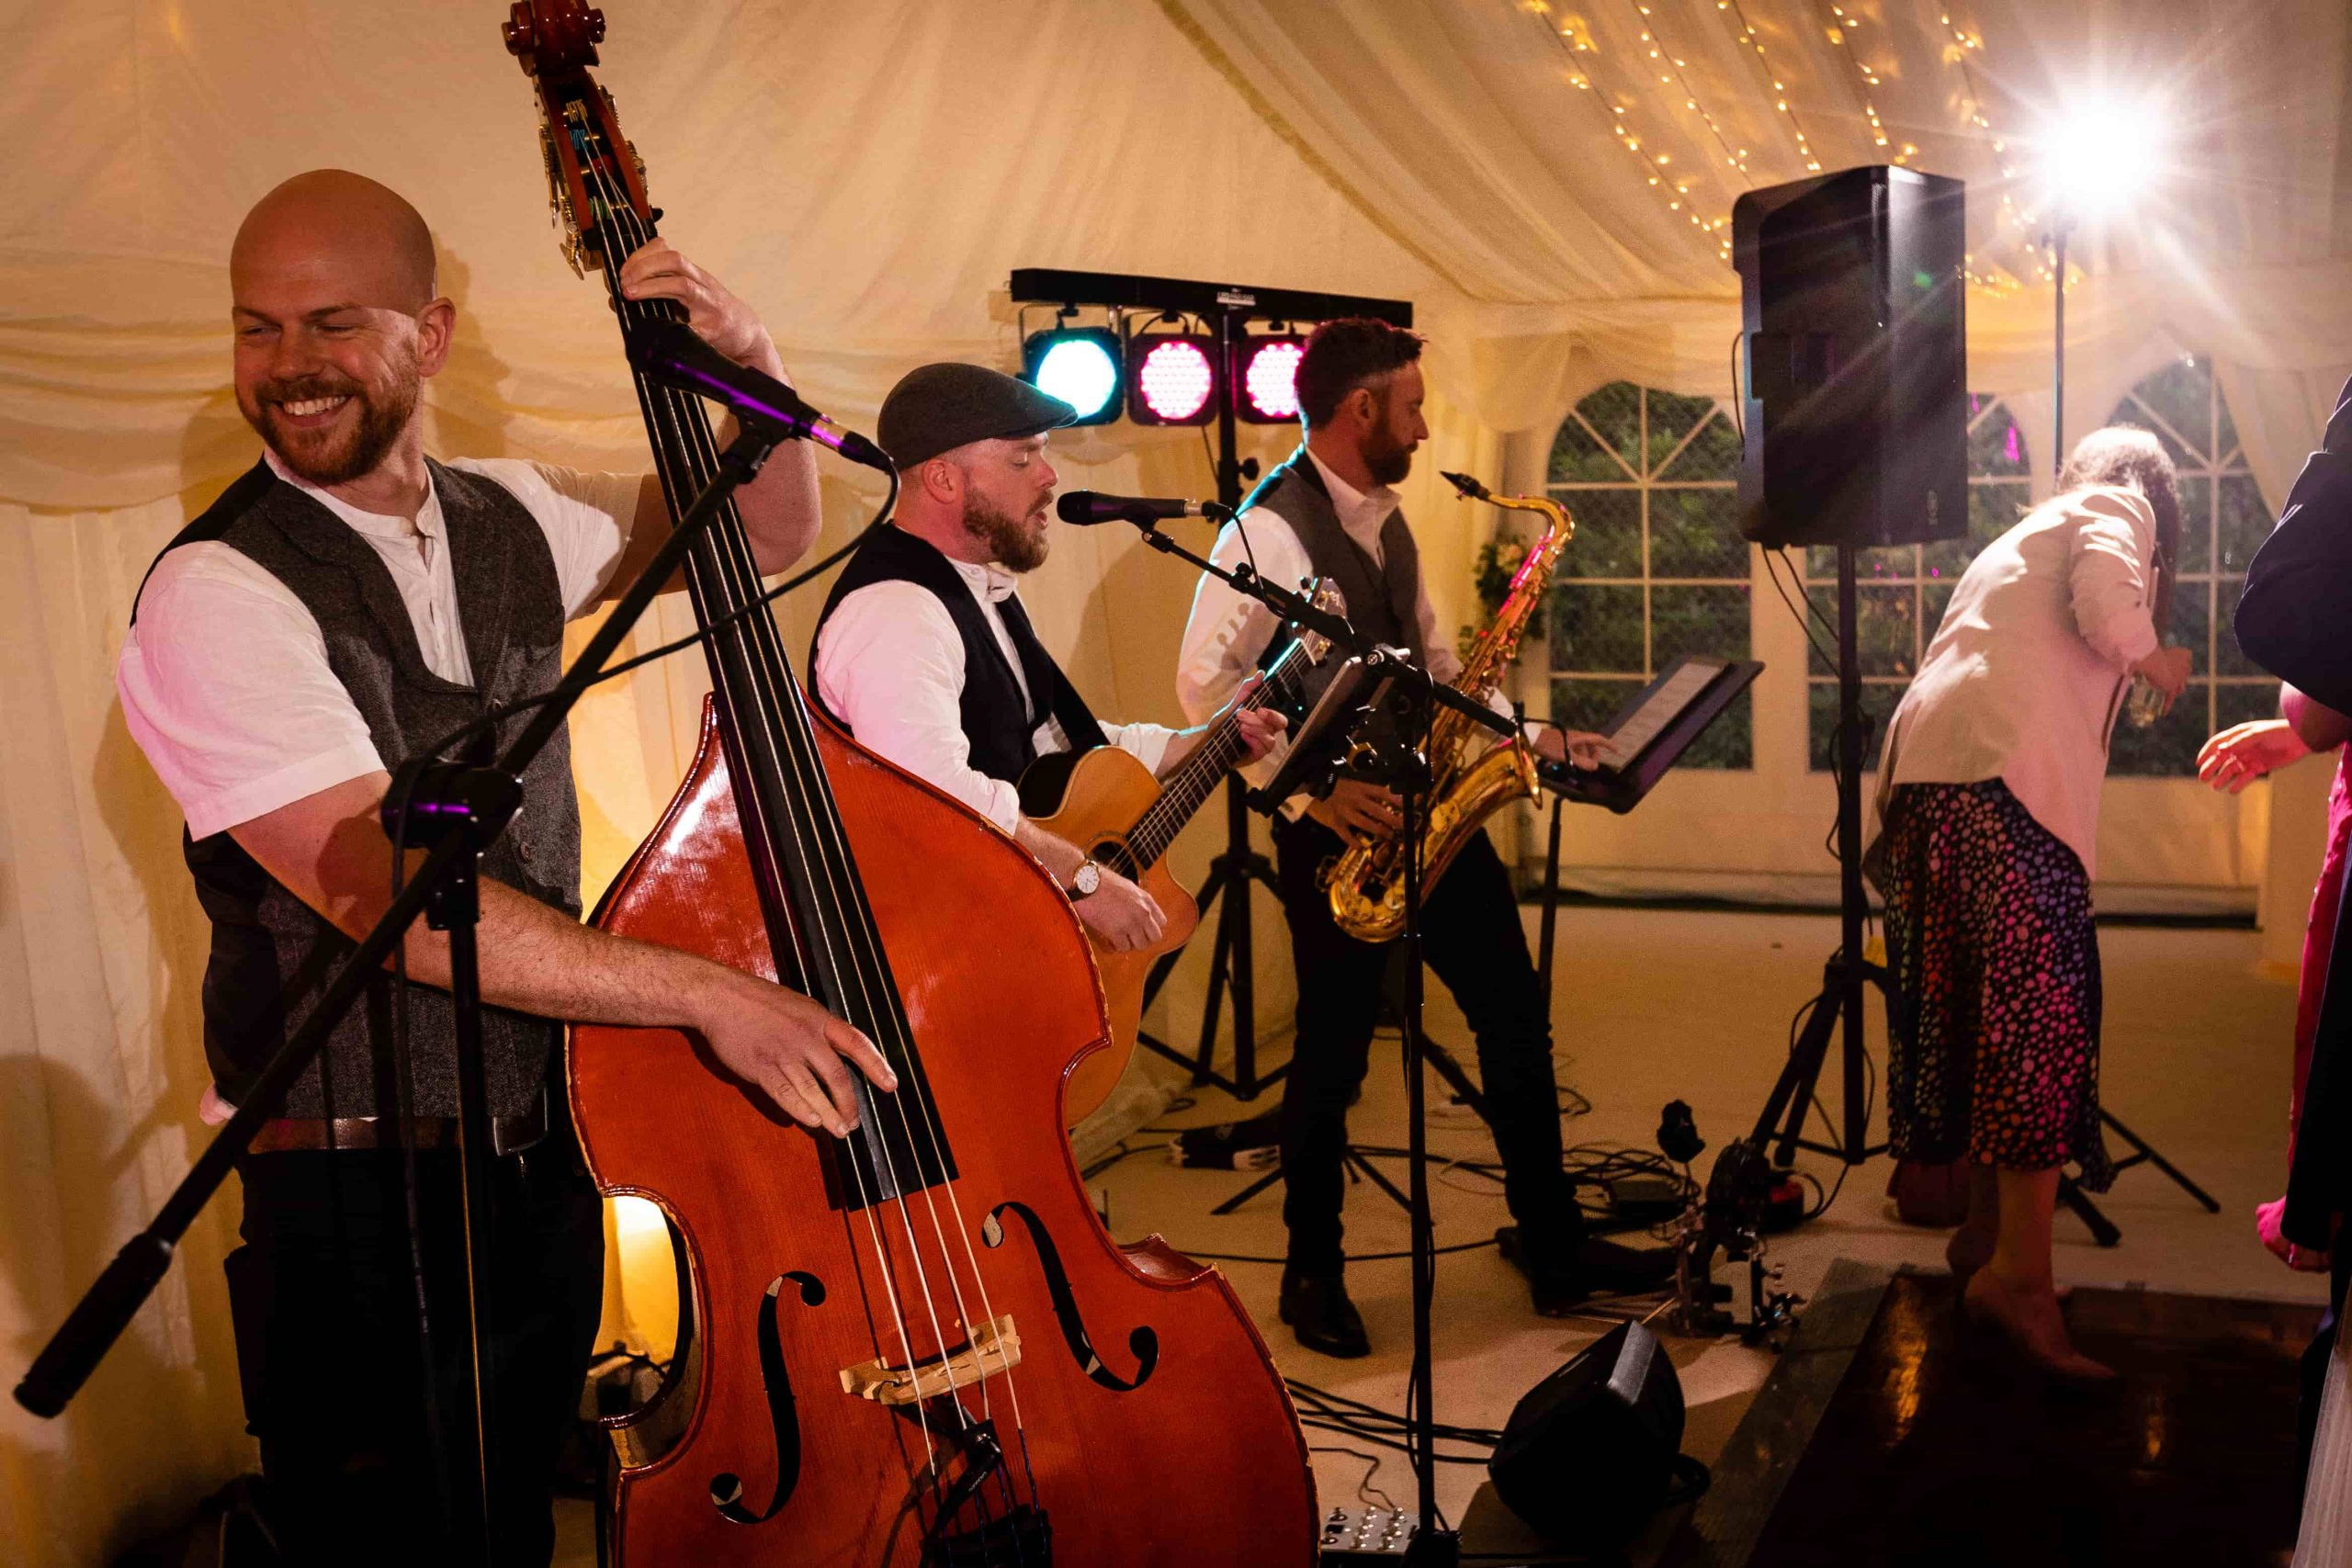 Folk wedding band The Wildermen performing